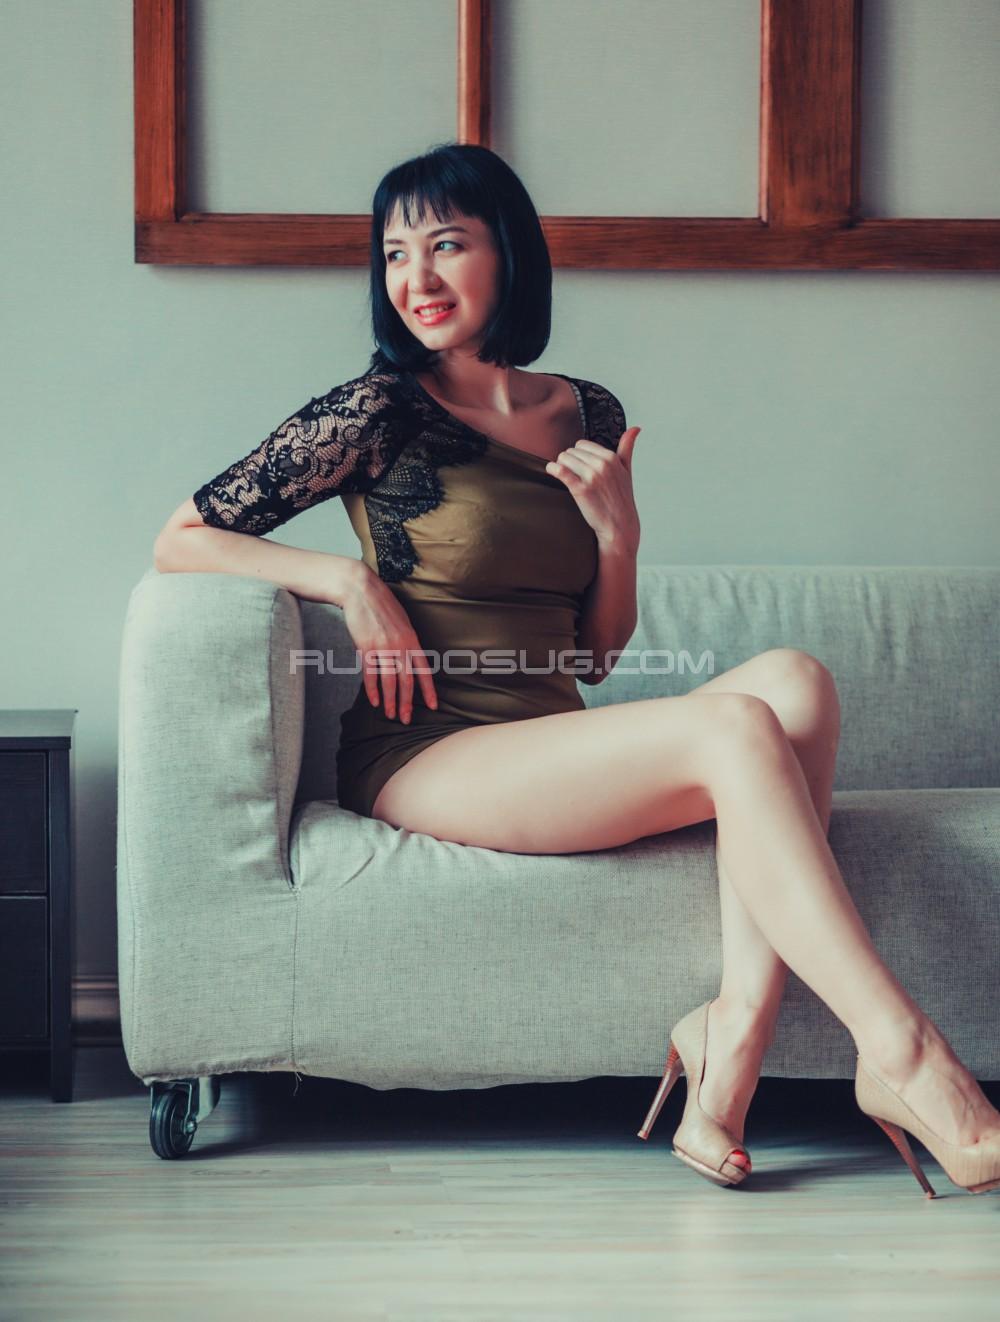 Сайт проституток кургана фото 474-973